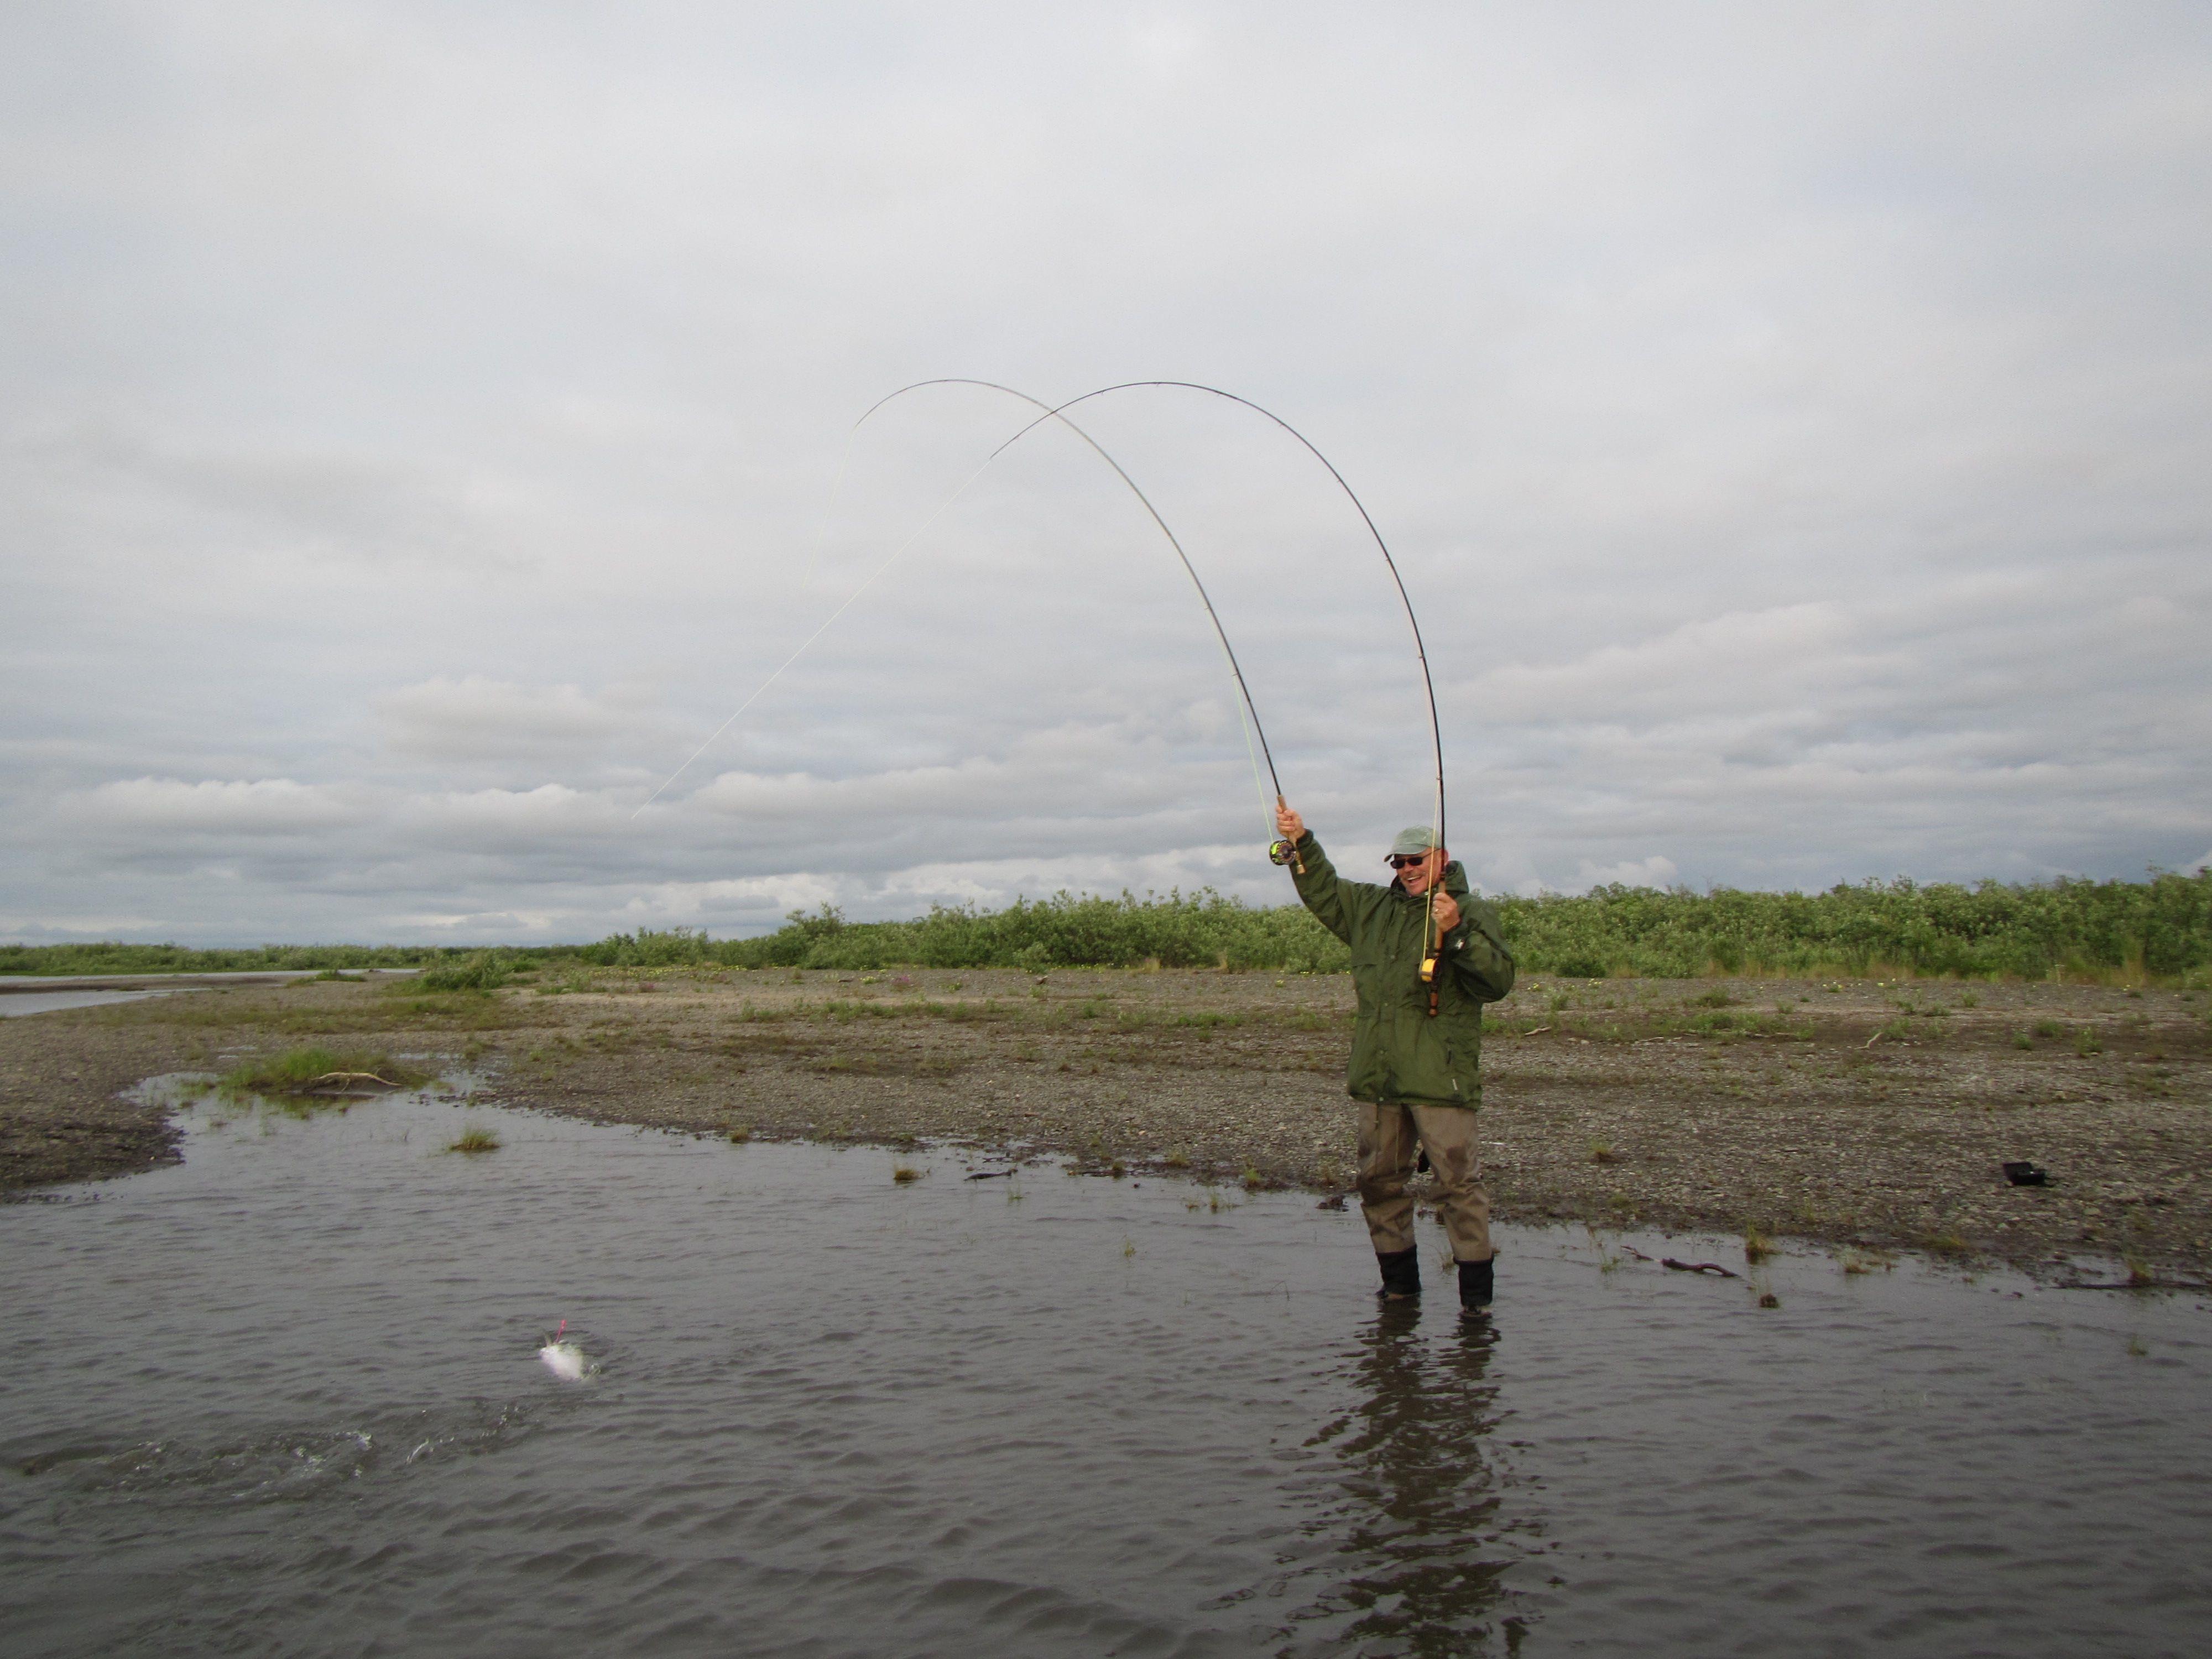 Fly fishing the kanektok river for chum salmon alaska for Alaska fly fishing